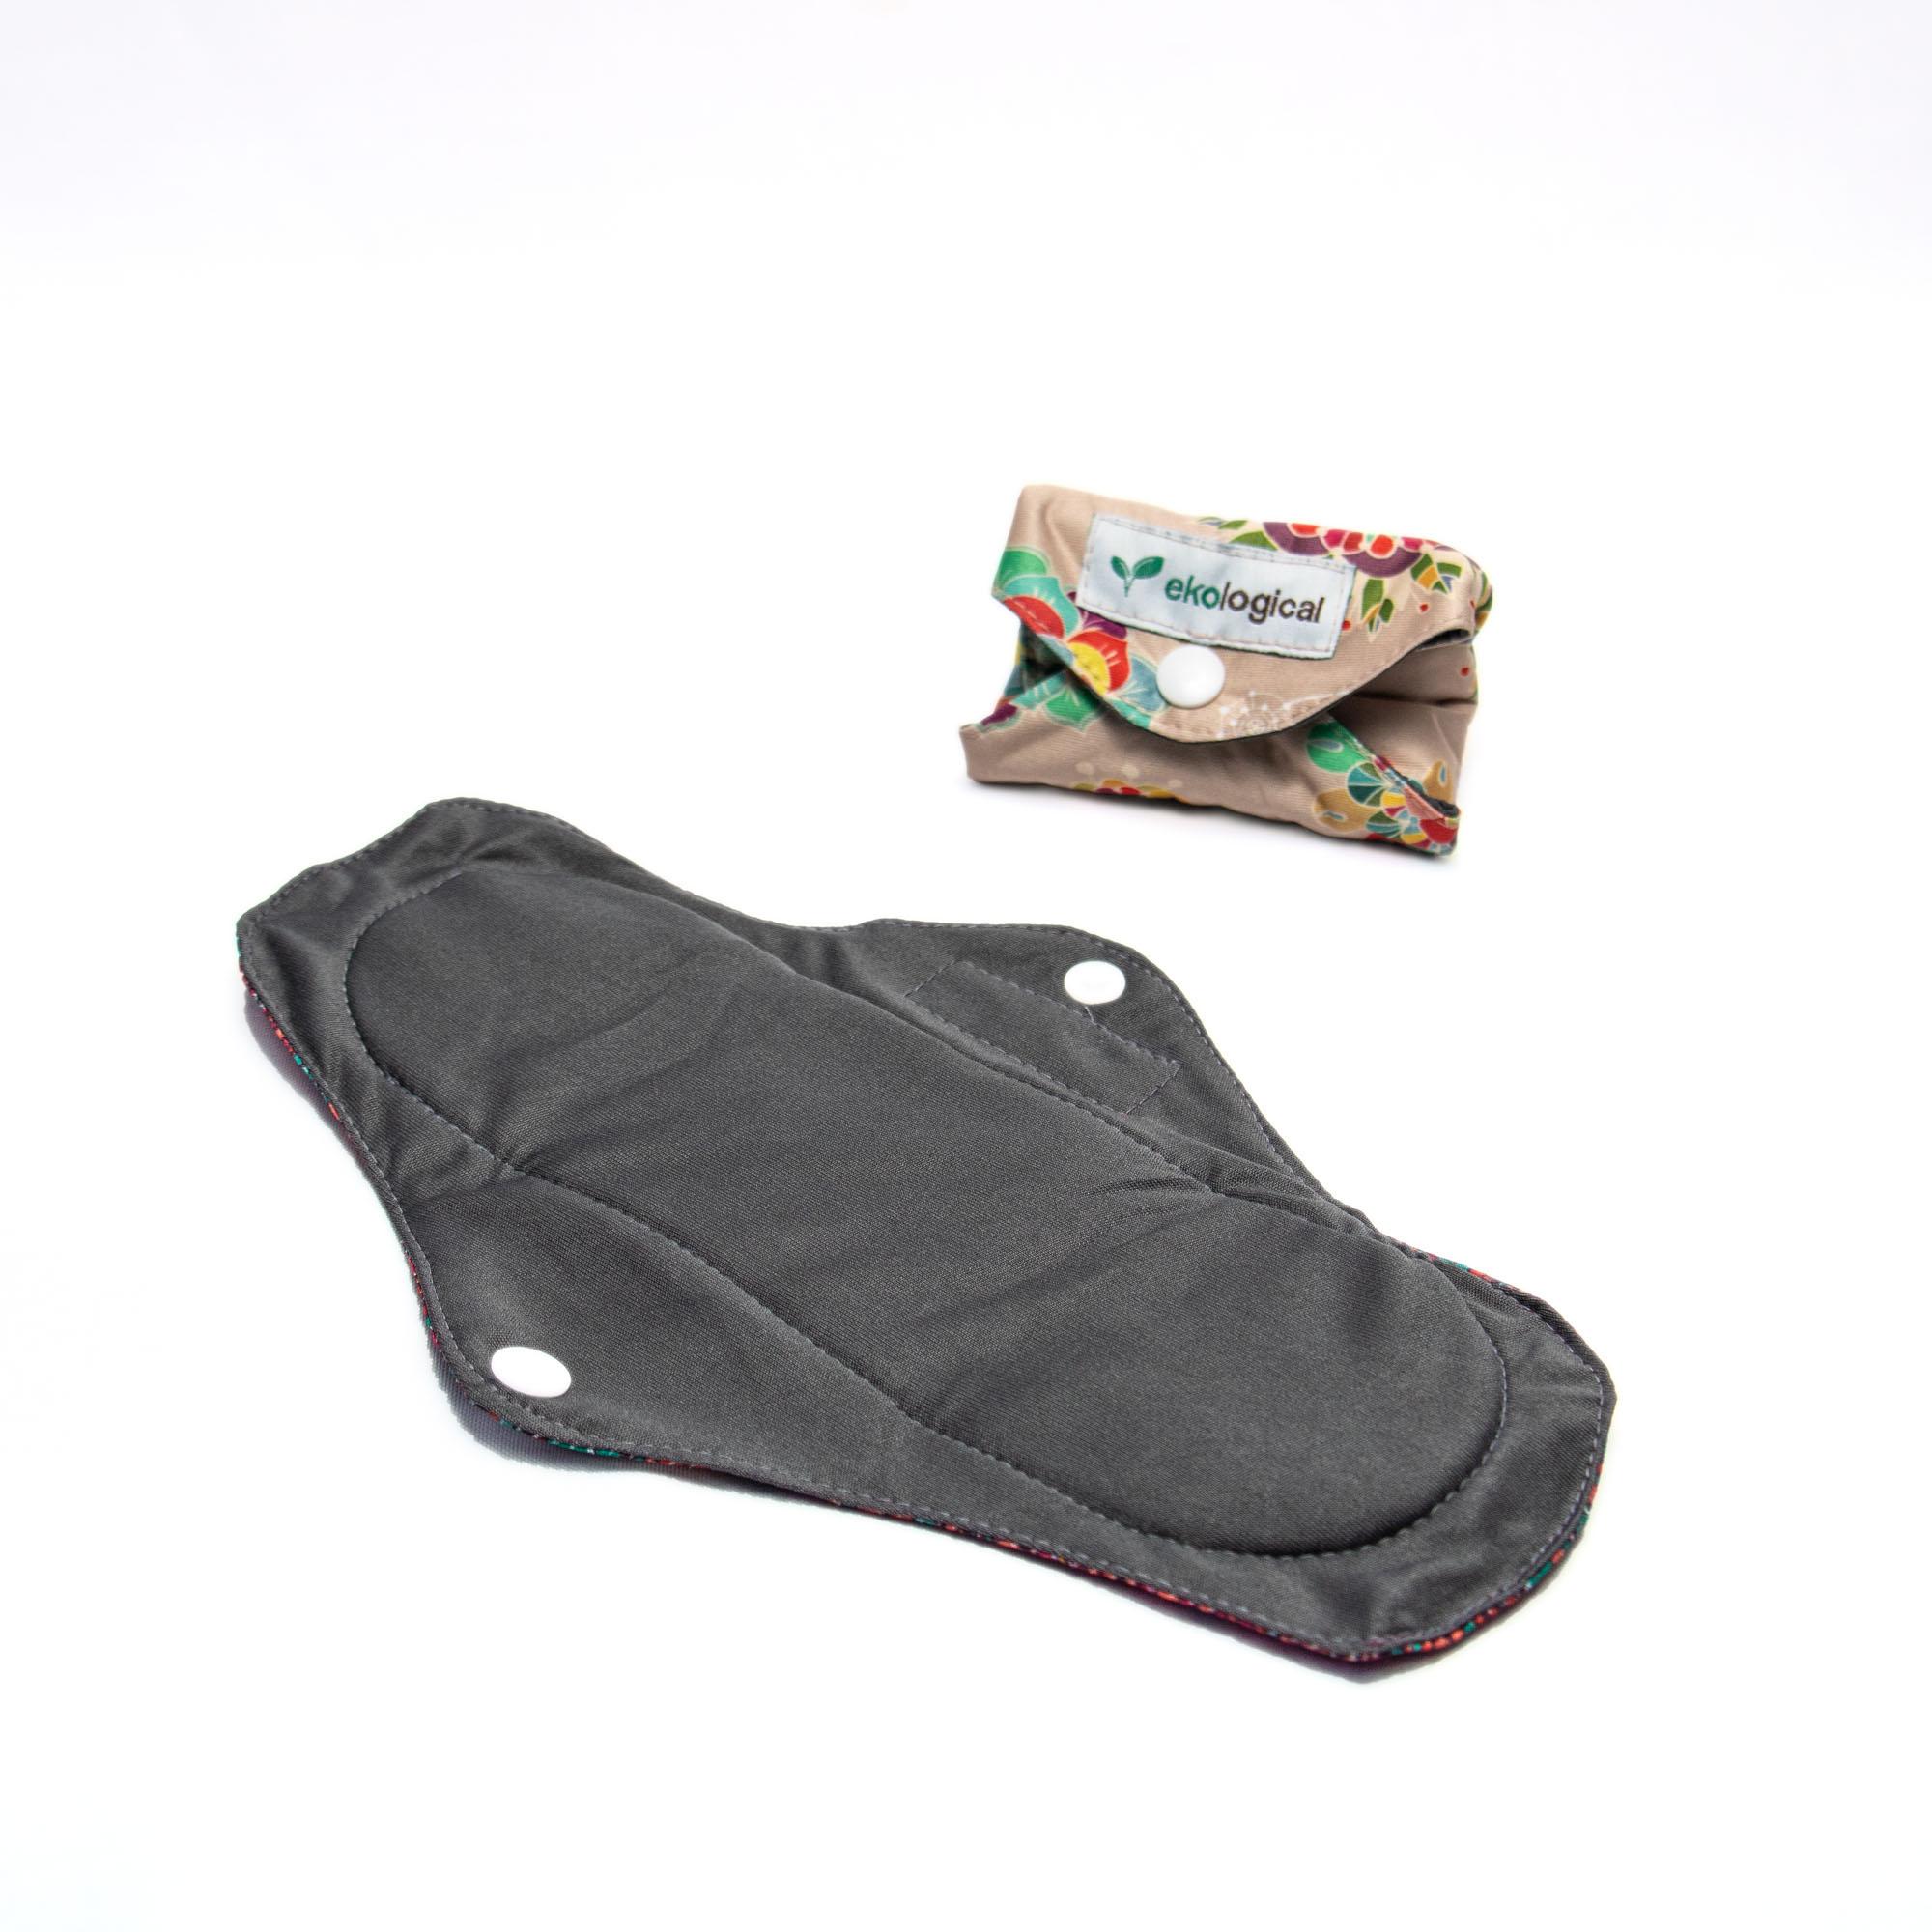 Kit de 7 Absorventes Menstruais de Pano Reutilizáveis